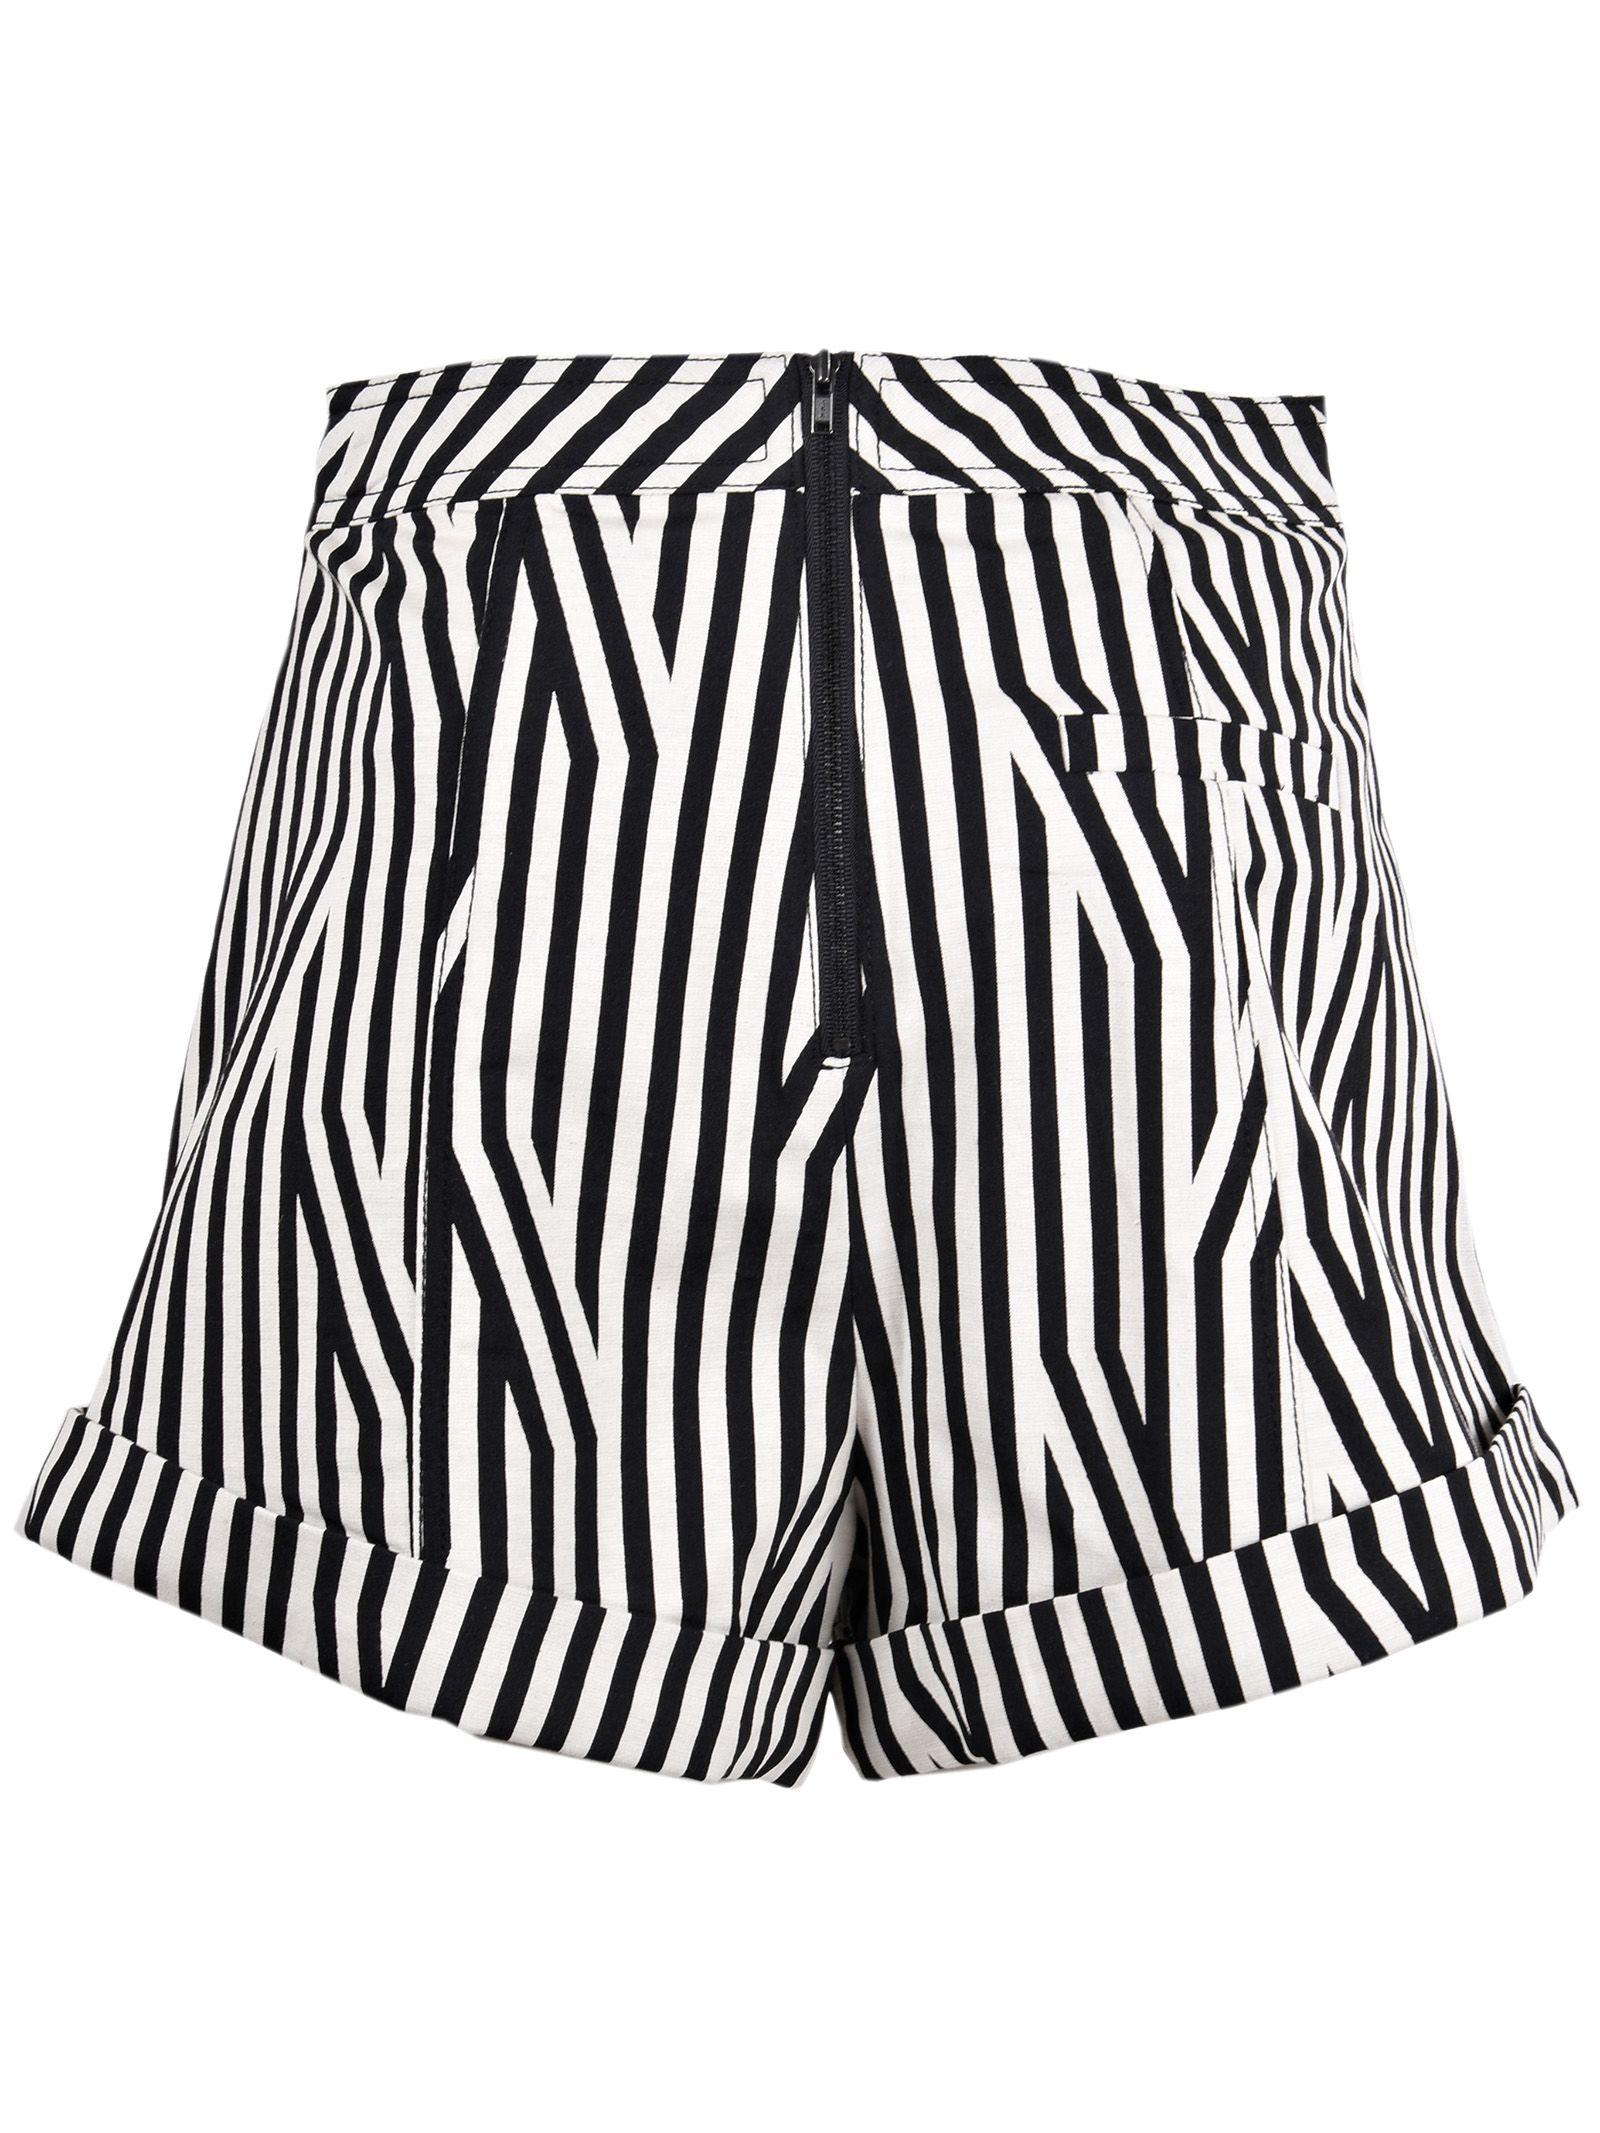 lace up front striped shorts - Black Self Portrait 9NVJpcniI5